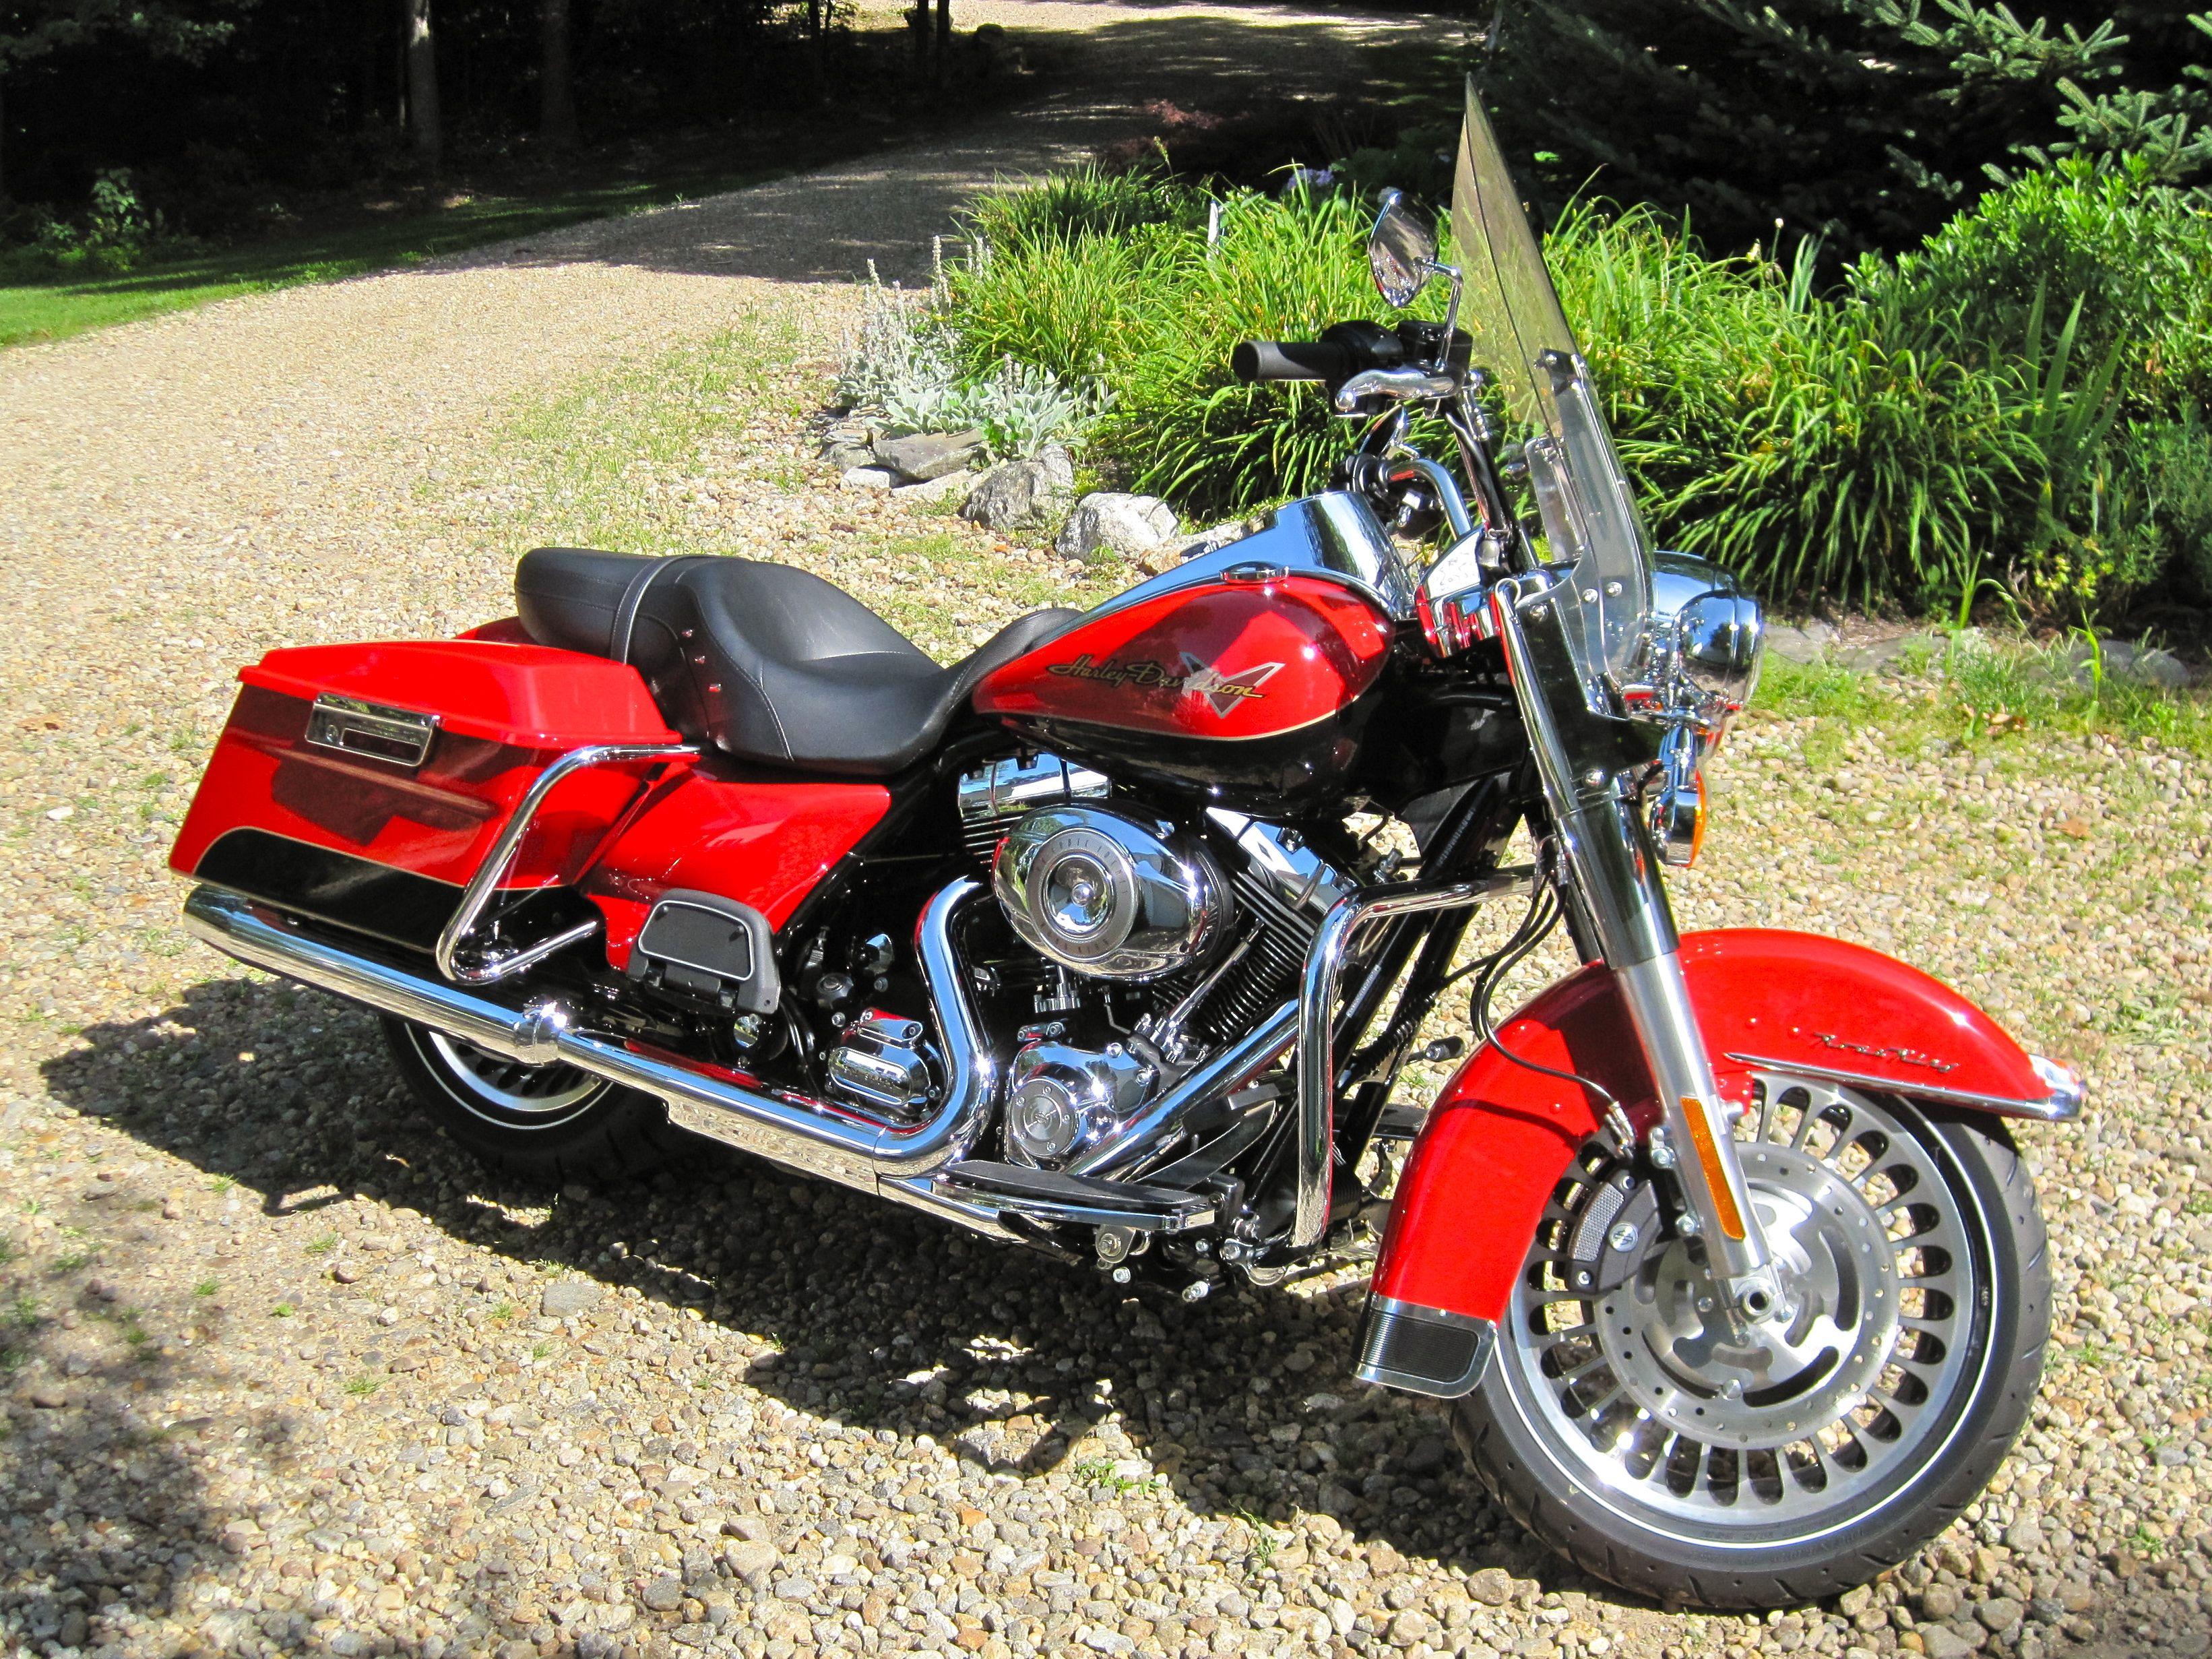 2010 new ride